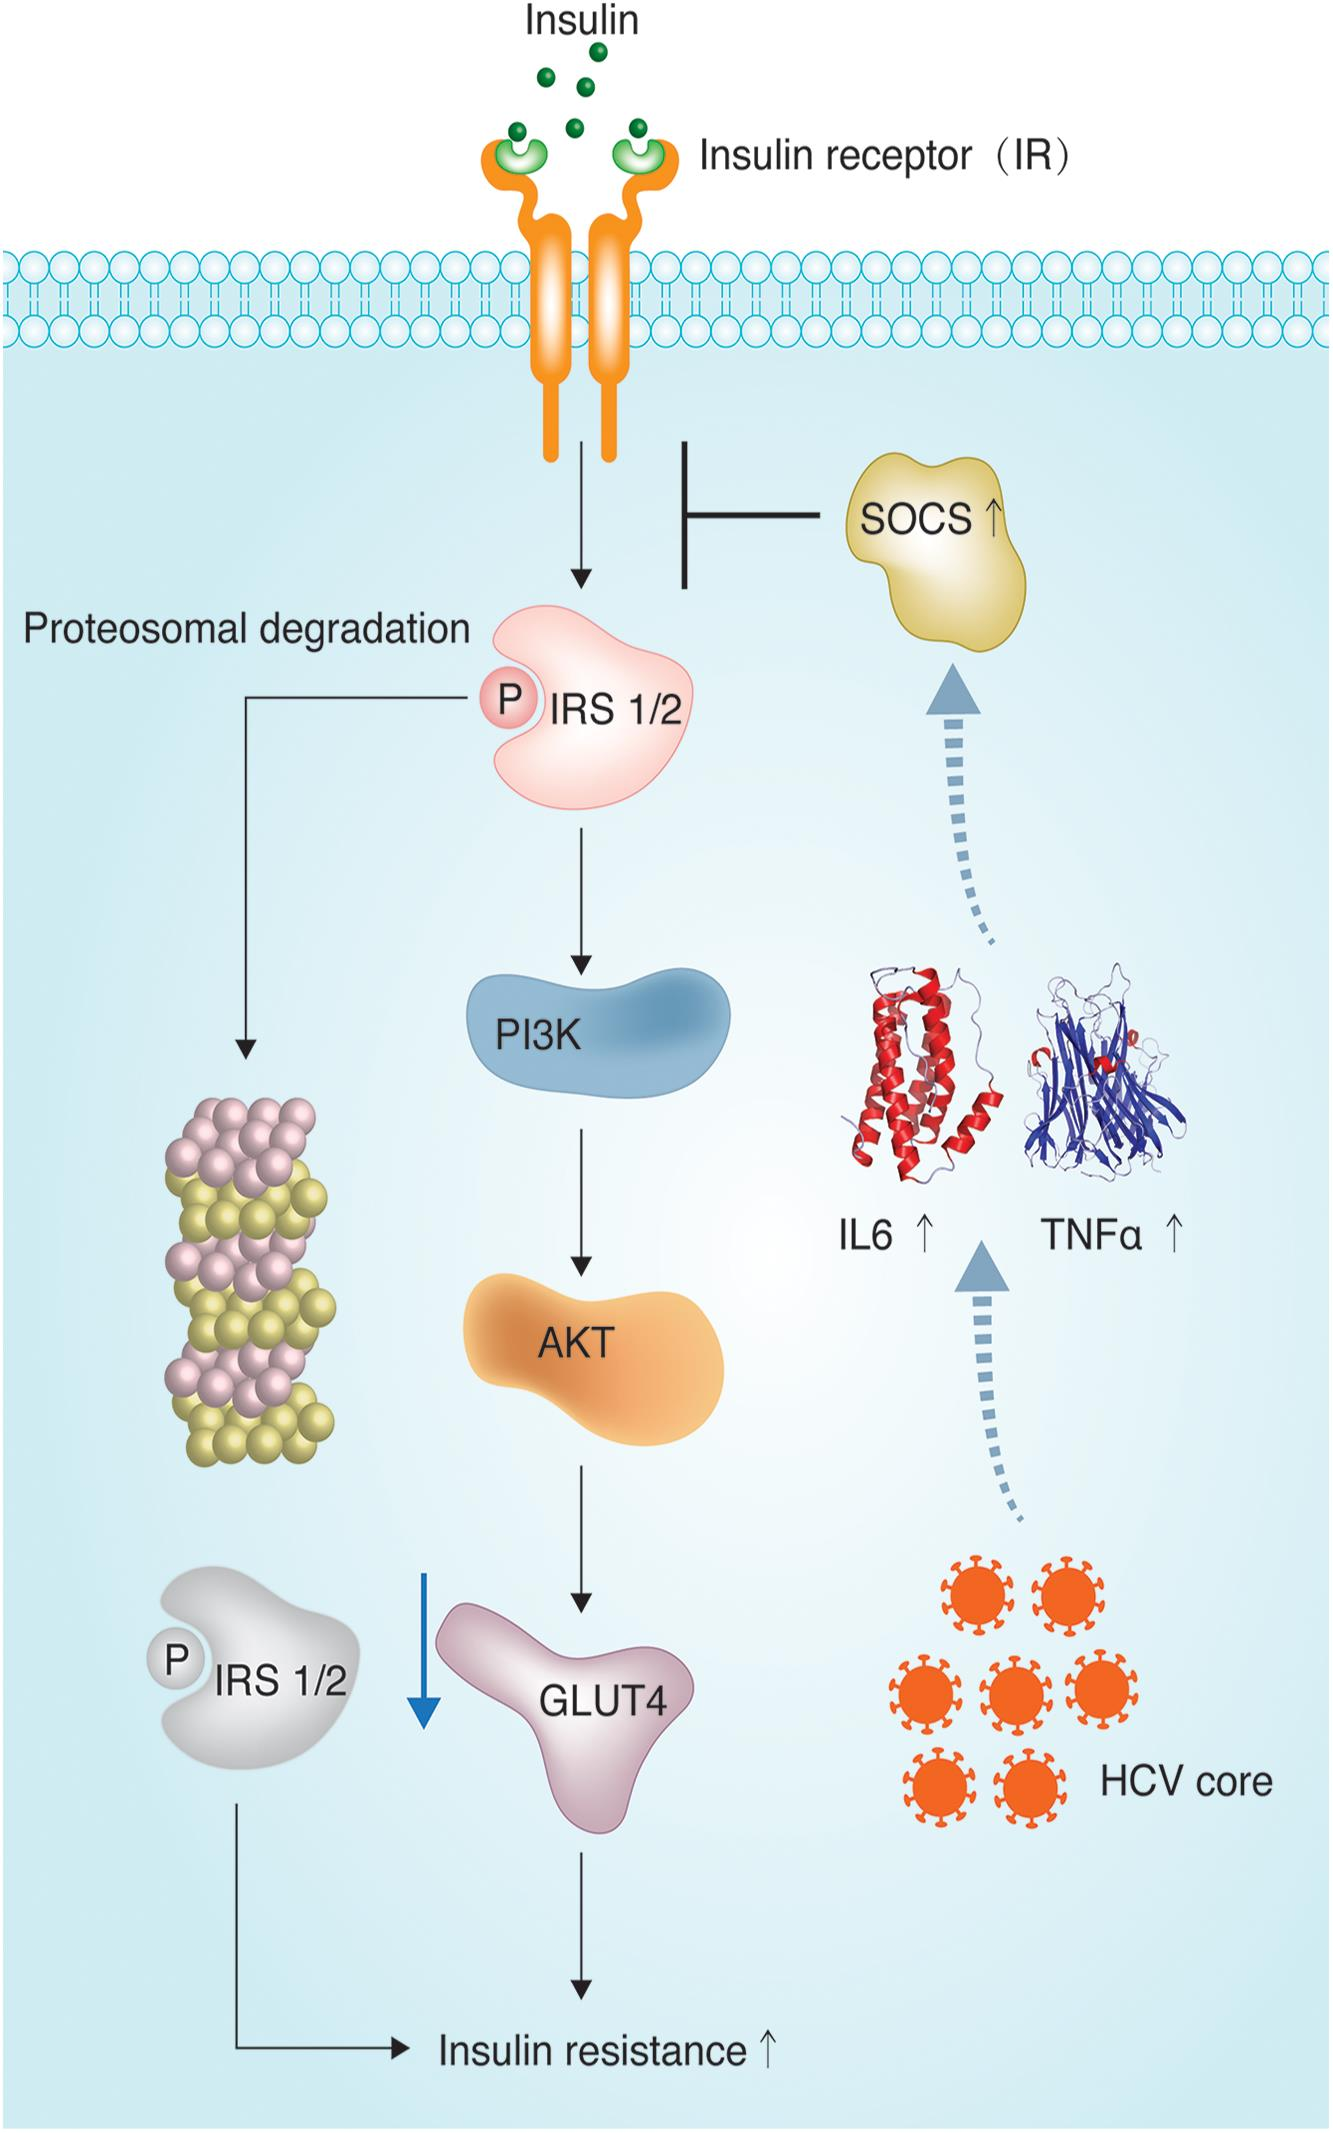 Hepatitis C virus affects the insulin signaling cascade.